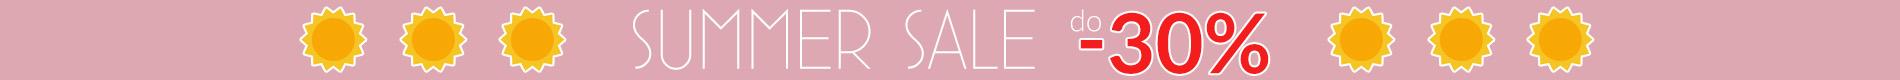 Summer Sale do -30% promocja!